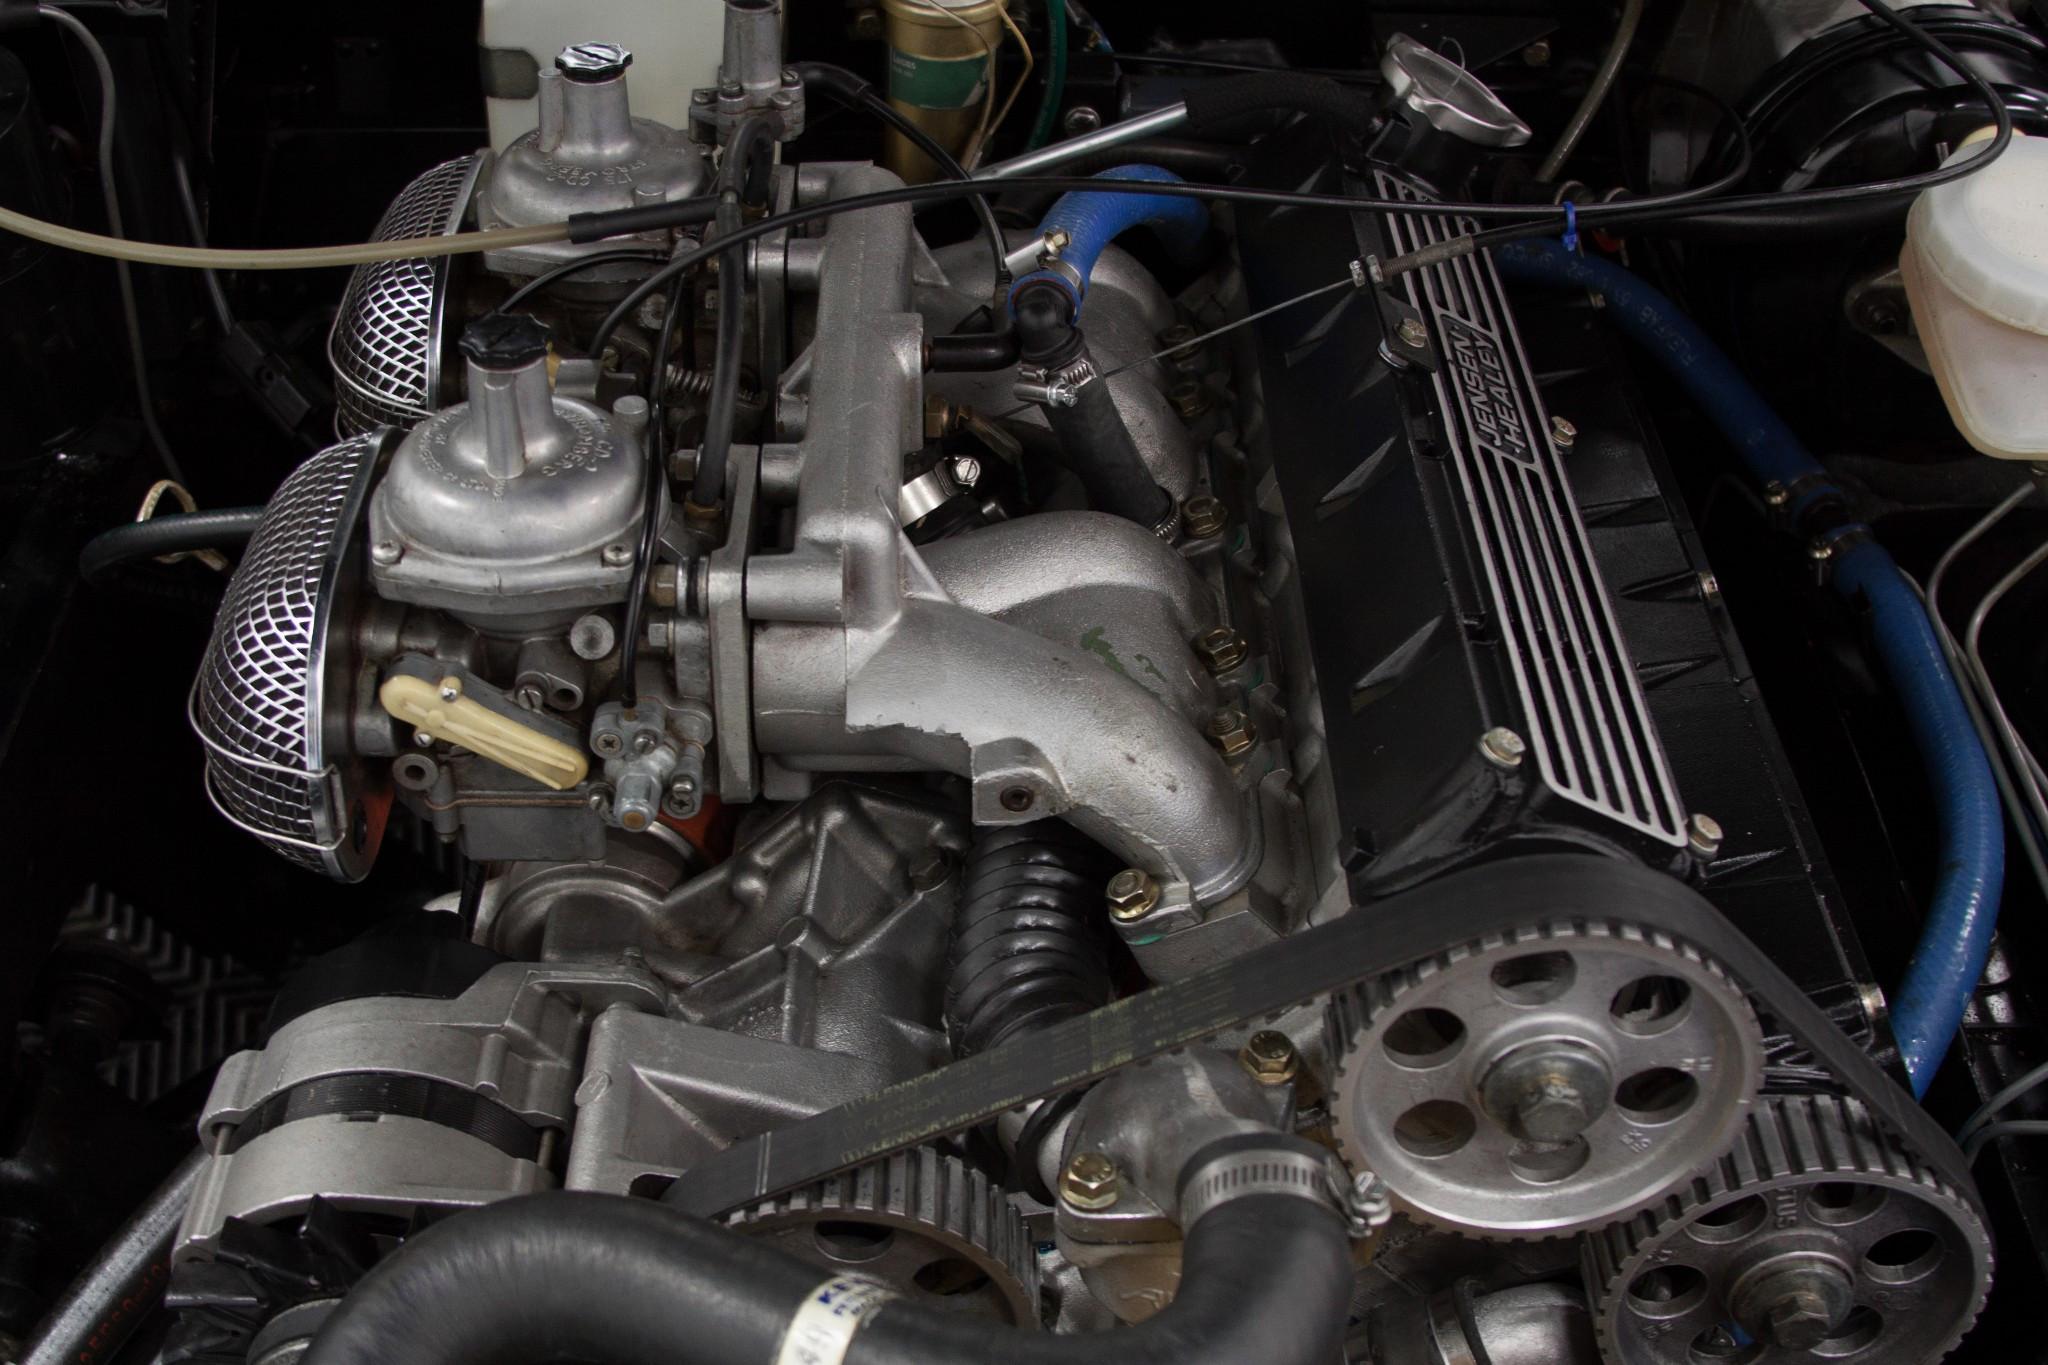 Jensen Healey JH5 engine front